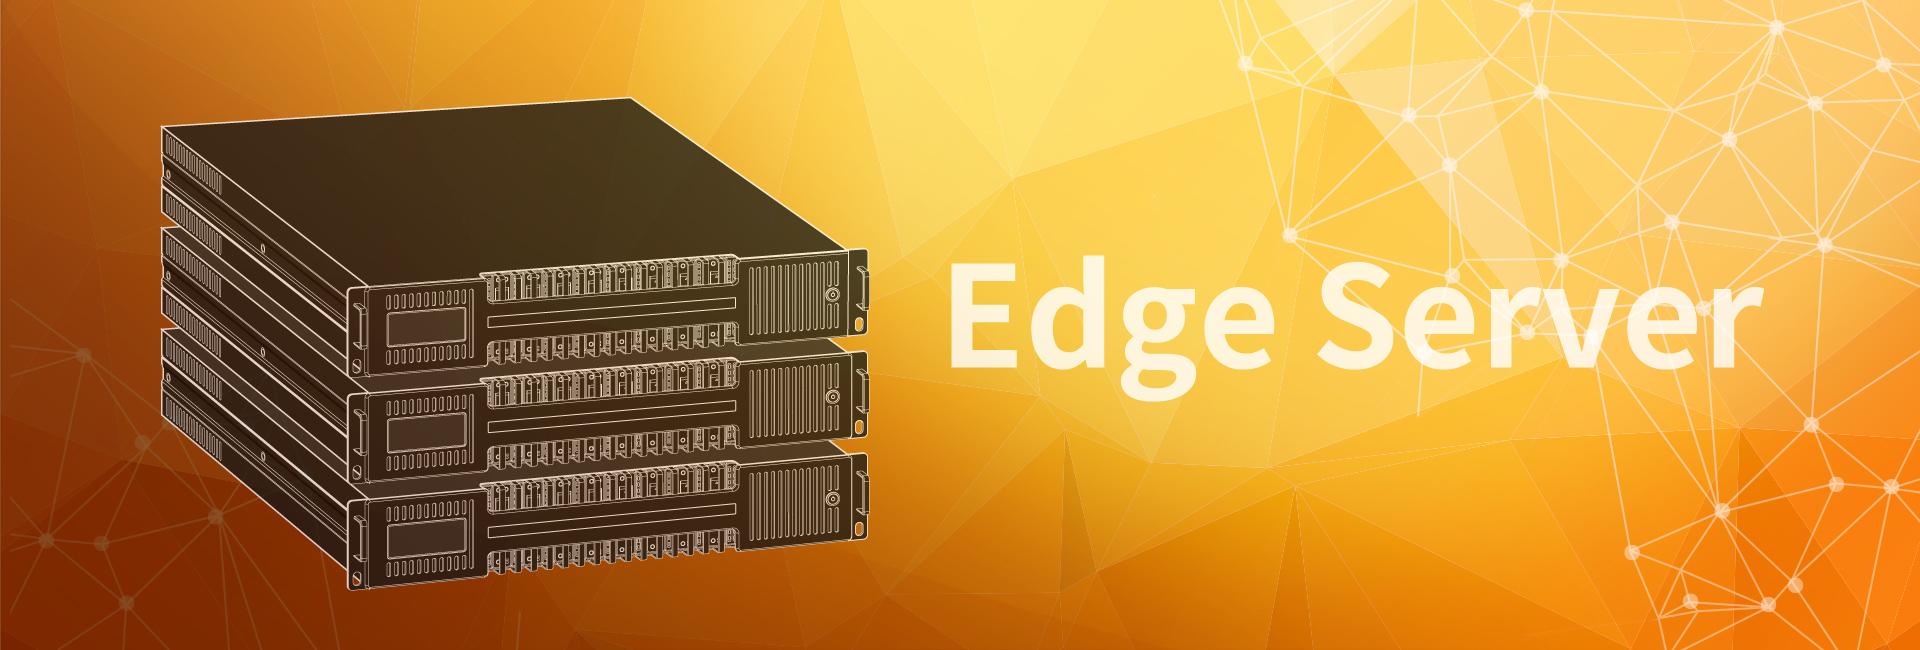 Edge Server邊緣伺服器